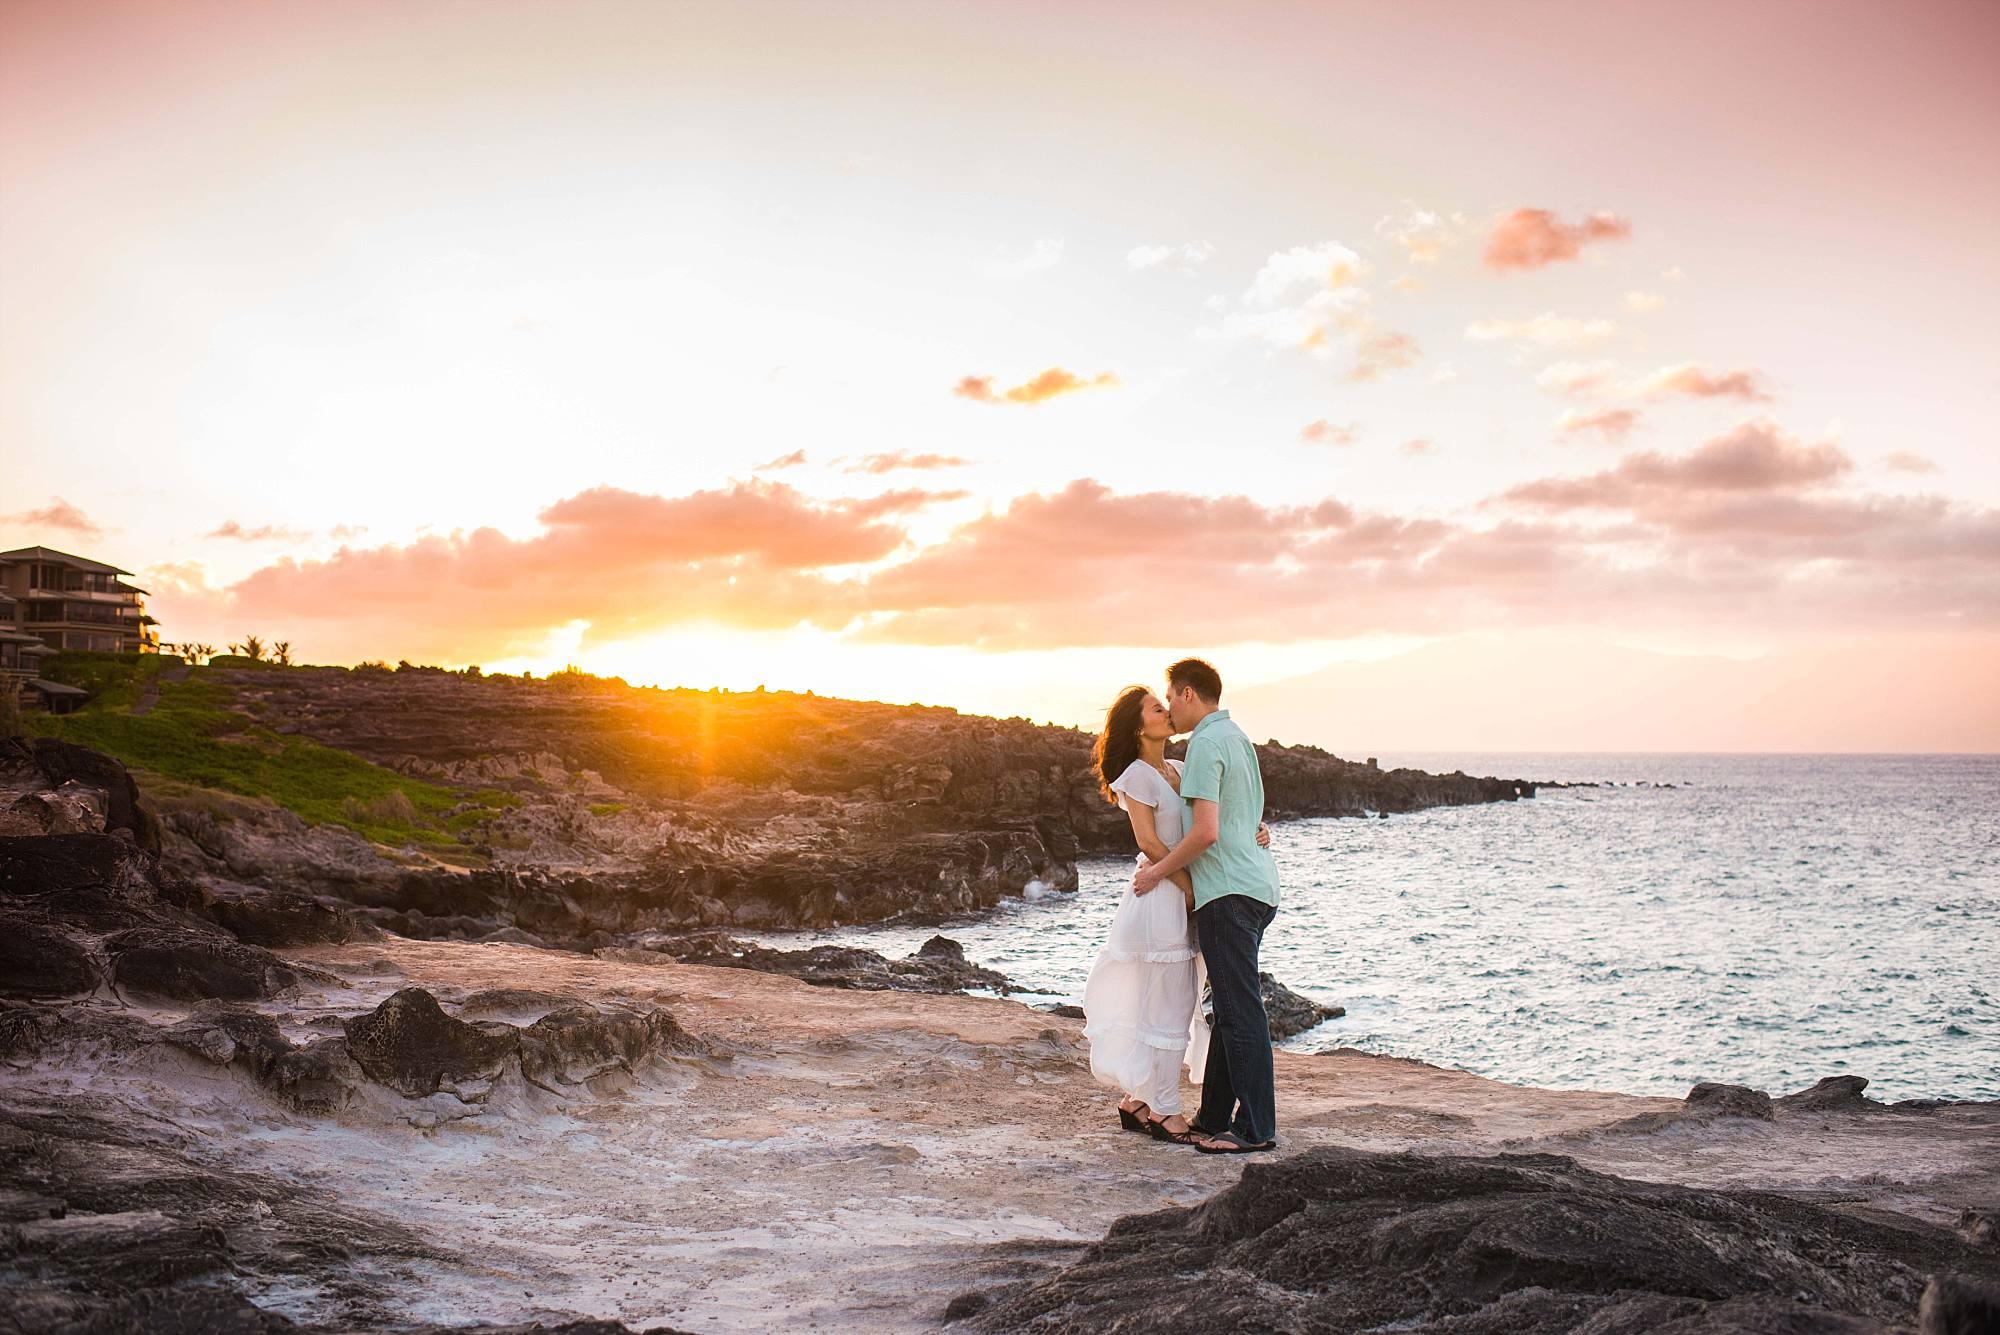 amazing sunset hitting the rocks, couple kissing on cliff